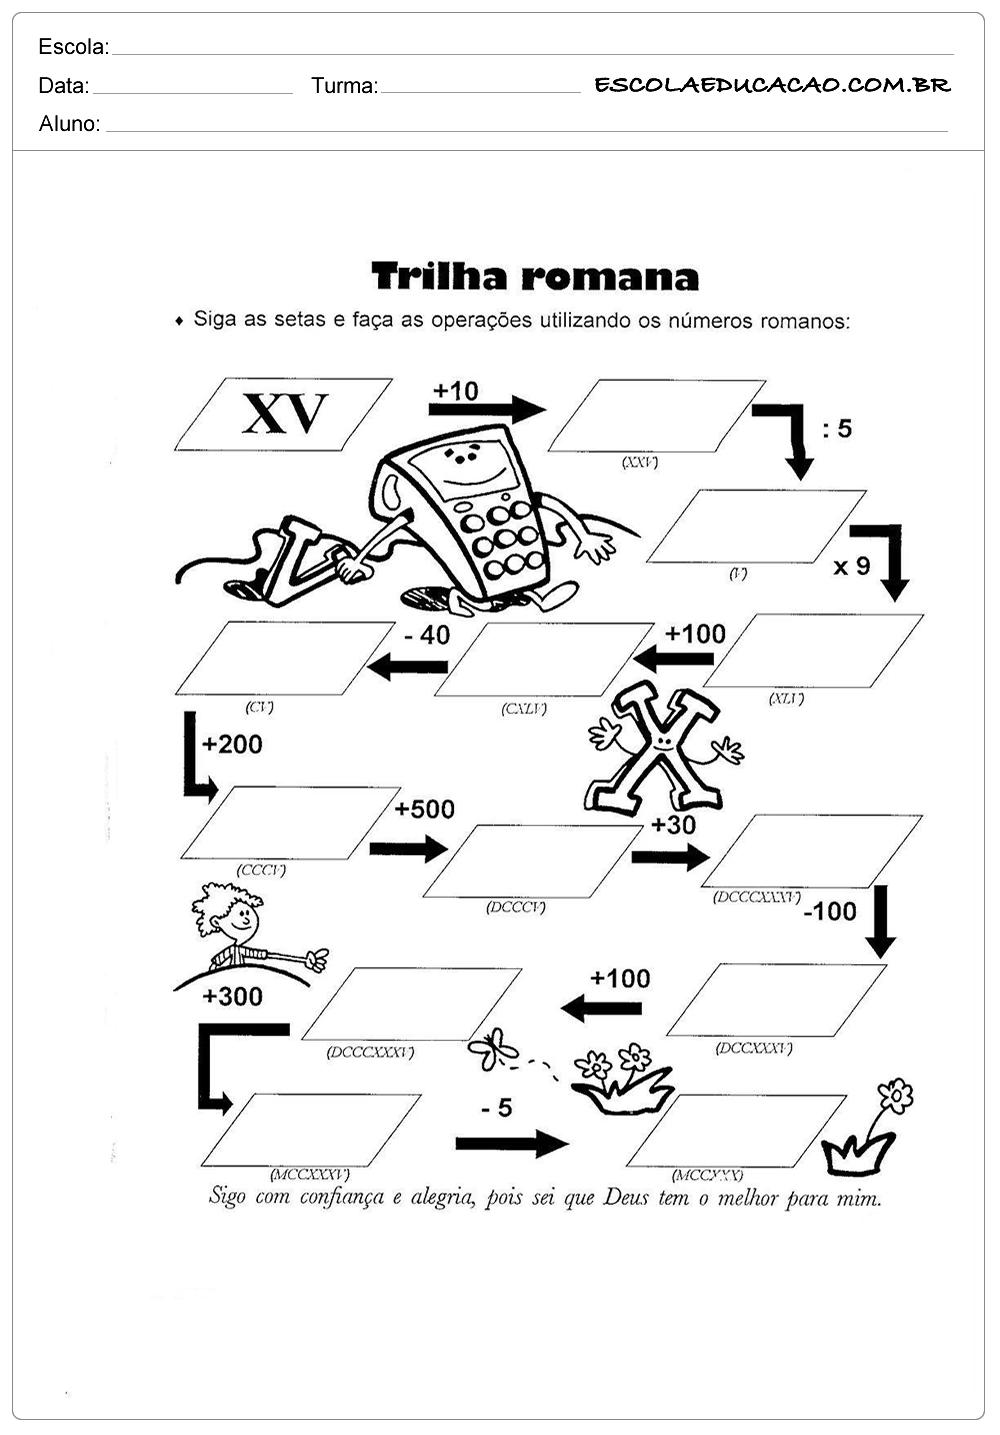 Trilha Romana